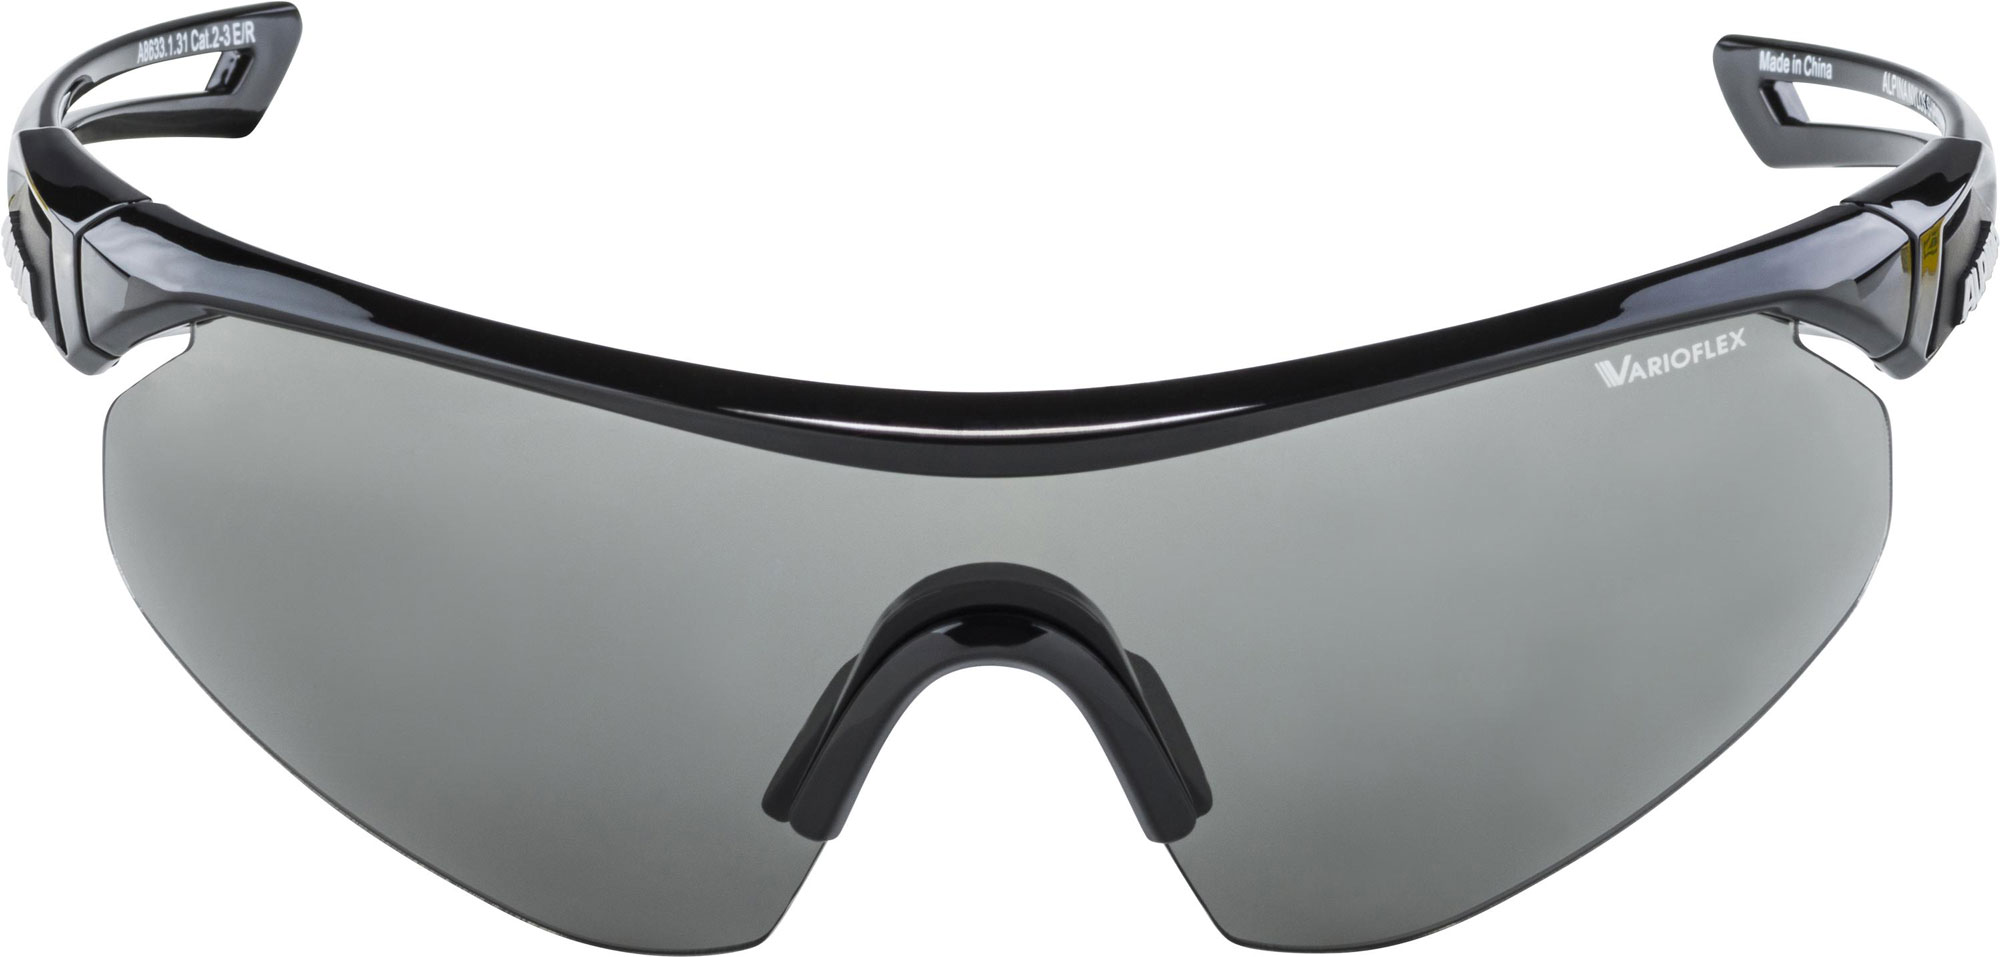 72cedc793 Alpina Sports NYLOS SHIELD VL. Unisex slnečné okuliare. Unisex slnečné  okuliare